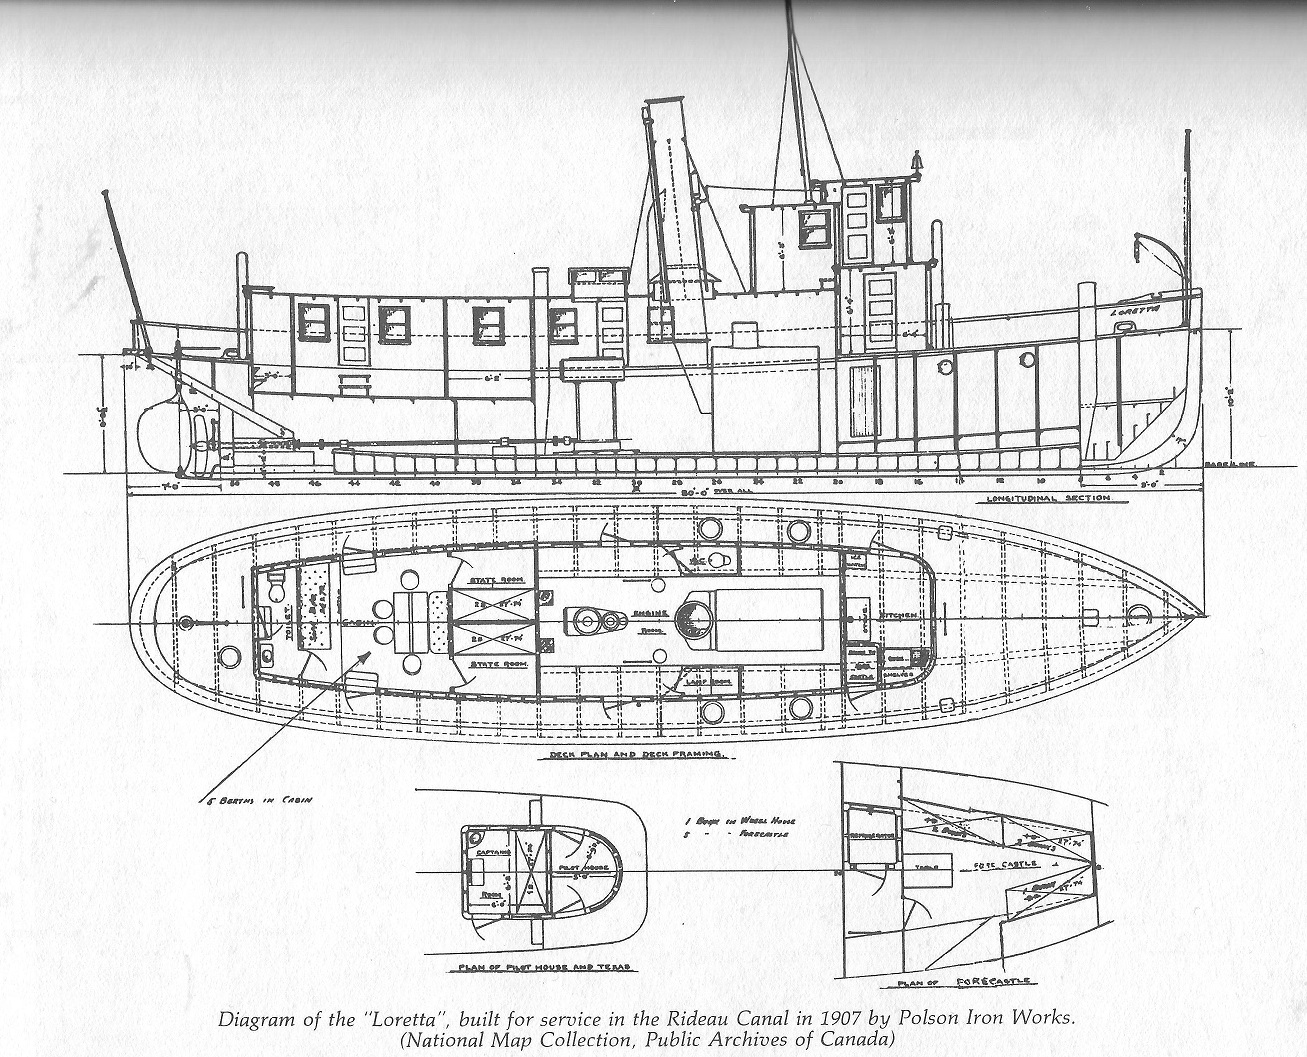 ridcanal diagram of the Tug Boat Loretta, built in 1907